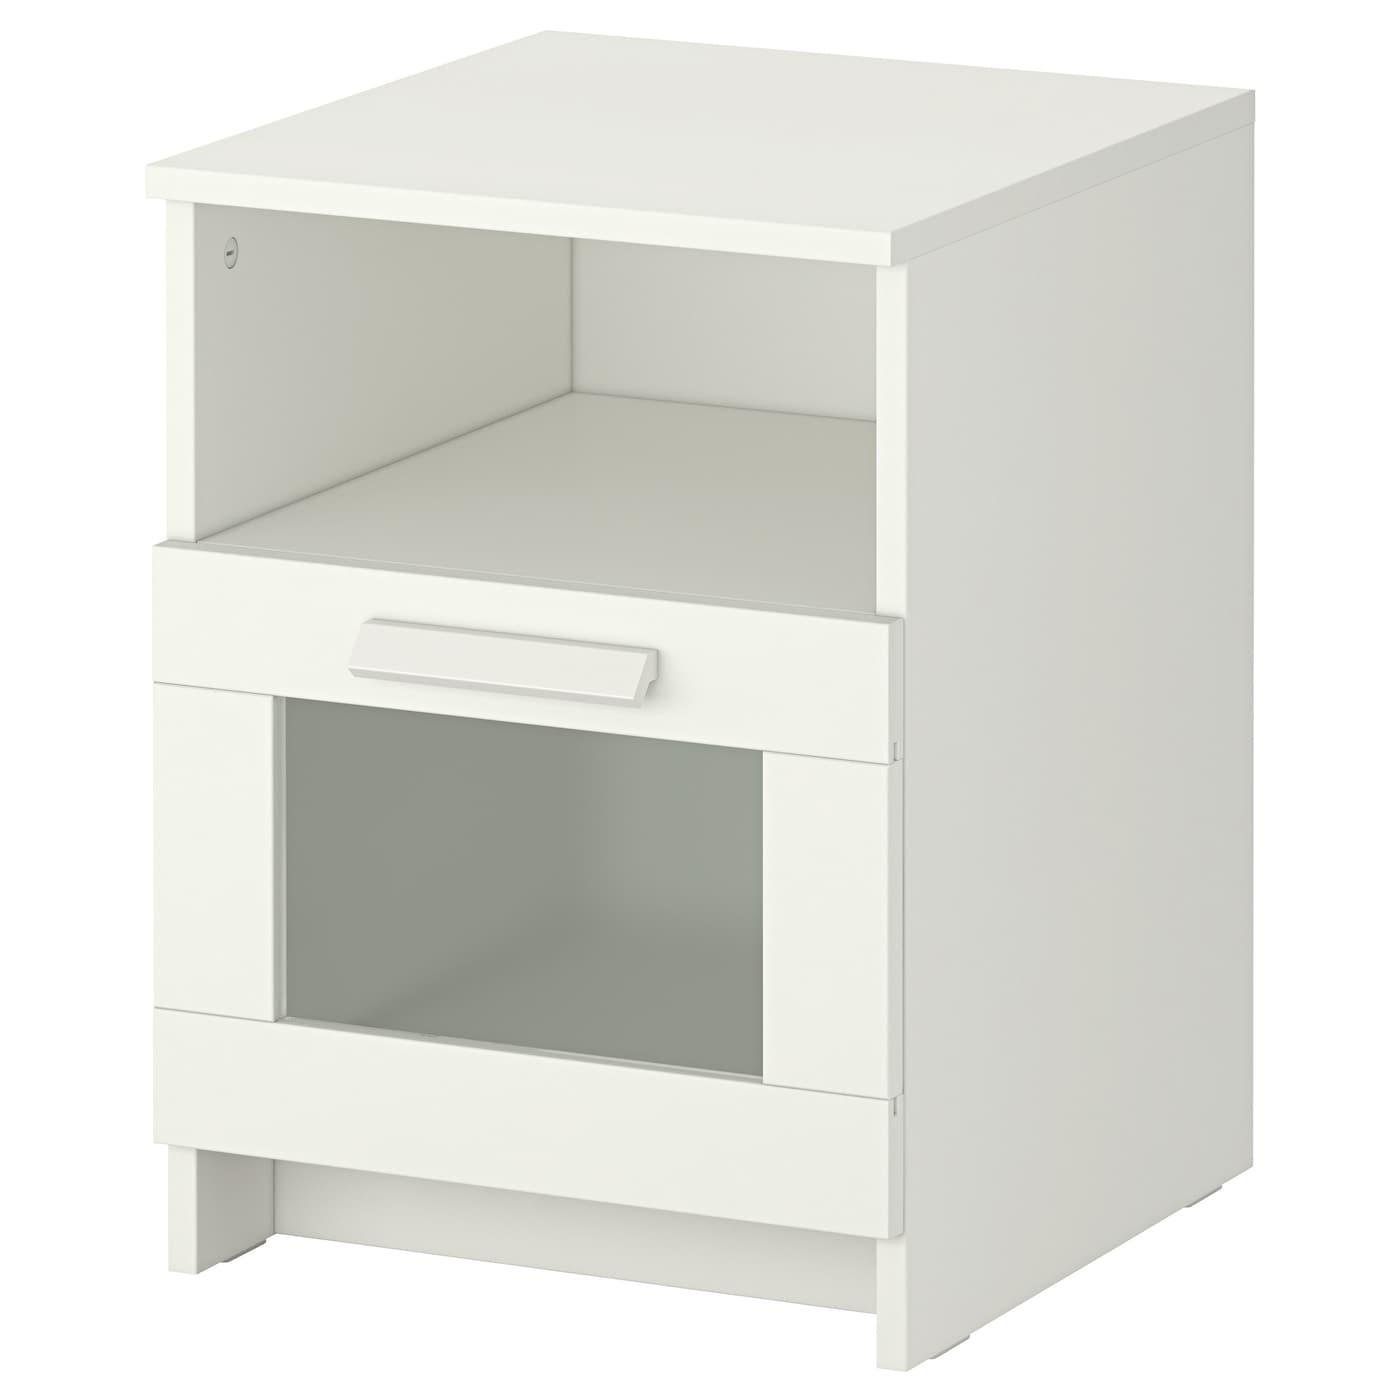 brimnes table de chevet blanc 39x41 cm ikea. Black Bedroom Furniture Sets. Home Design Ideas